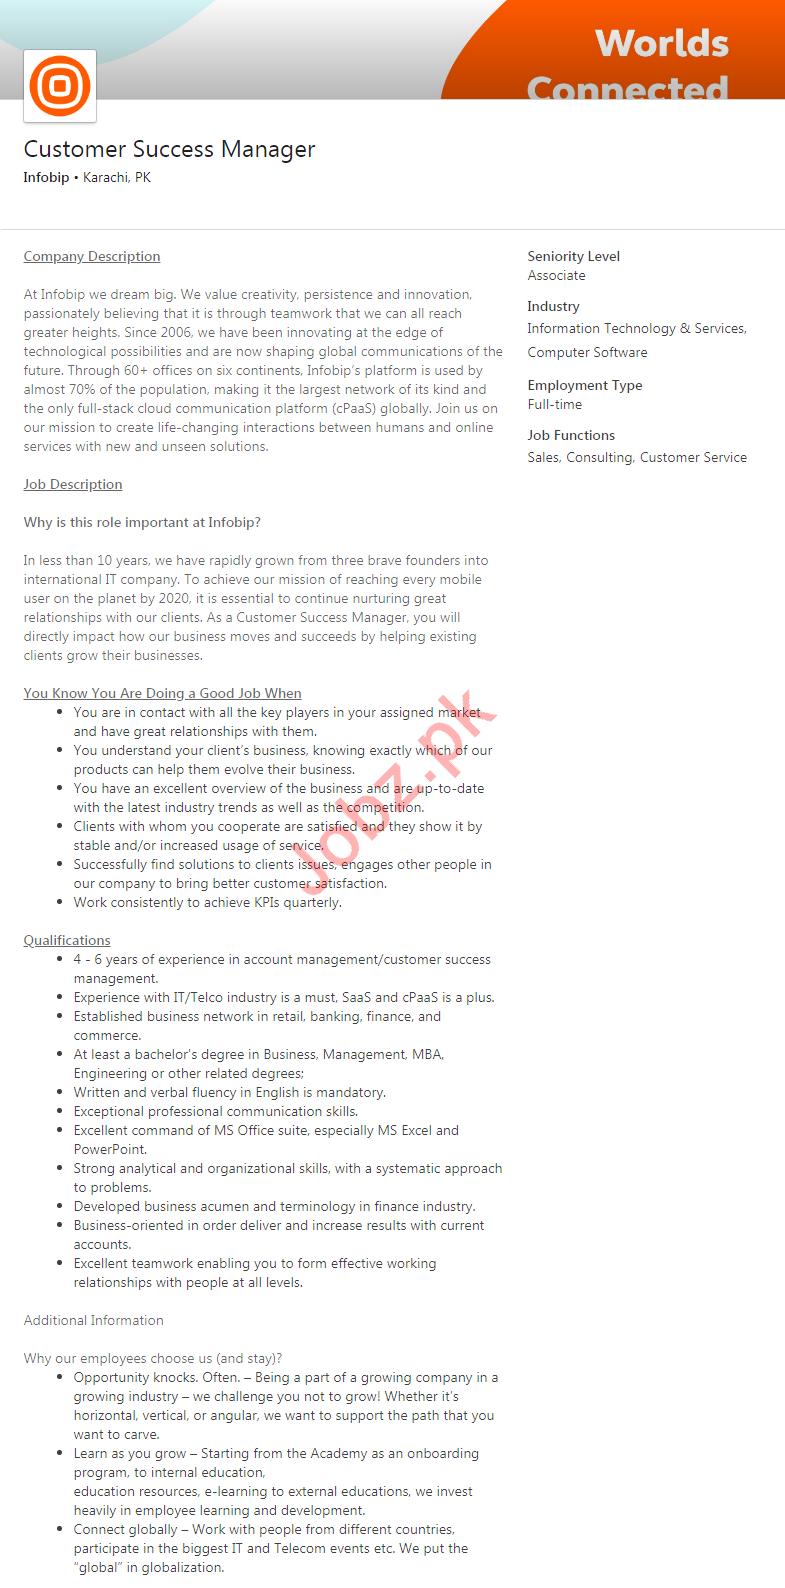 Customer Success Manager Job 2020 in Karachi